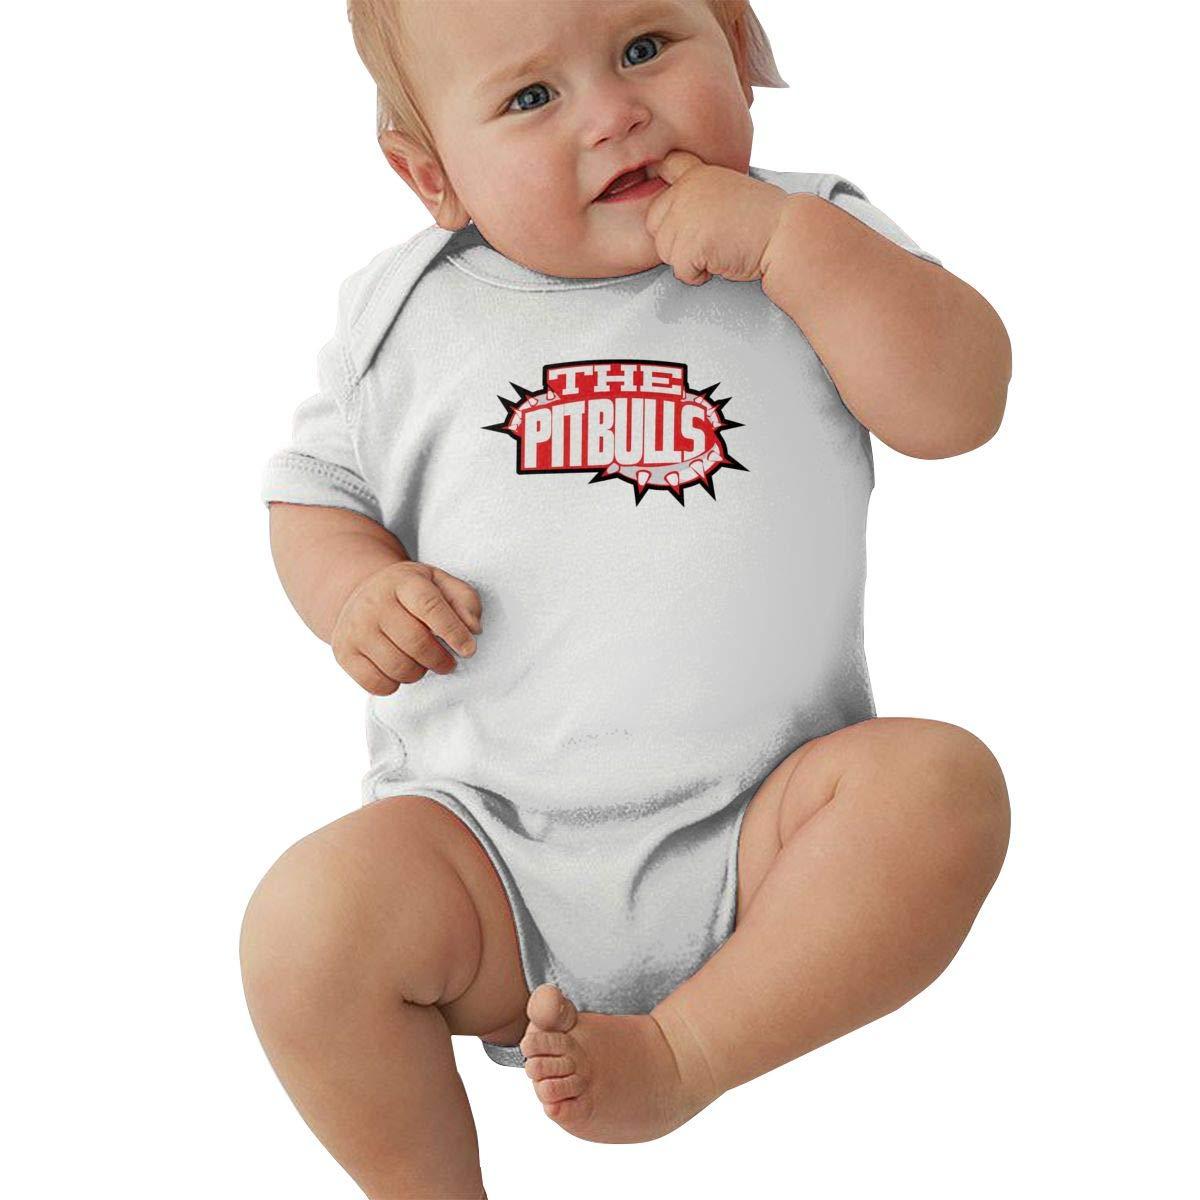 Dfenere Pitbull Dog Logo Retro Newborn Baby Short Sleeve Bodysuit Romper Infant Summer Clothing Black